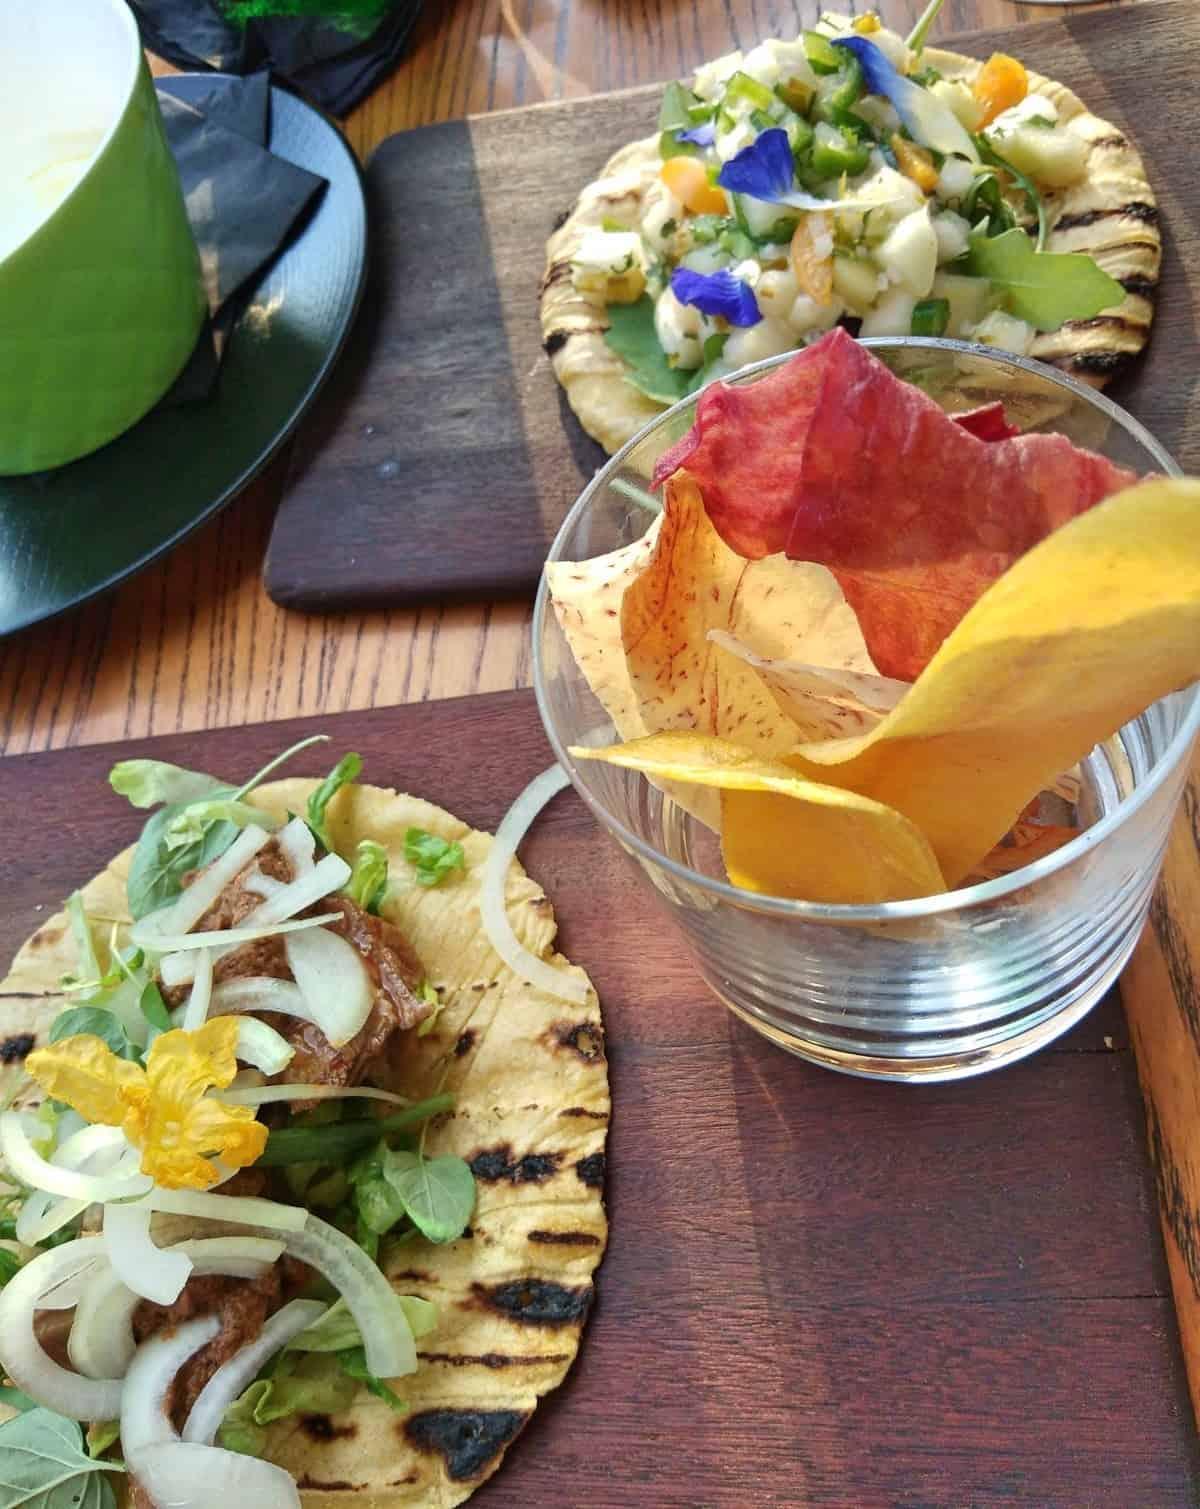 Fuegos-modern-South-American-restaurant-KLCC-Kuala-Lumpur-Malaysia-Travel-Mermaid-11